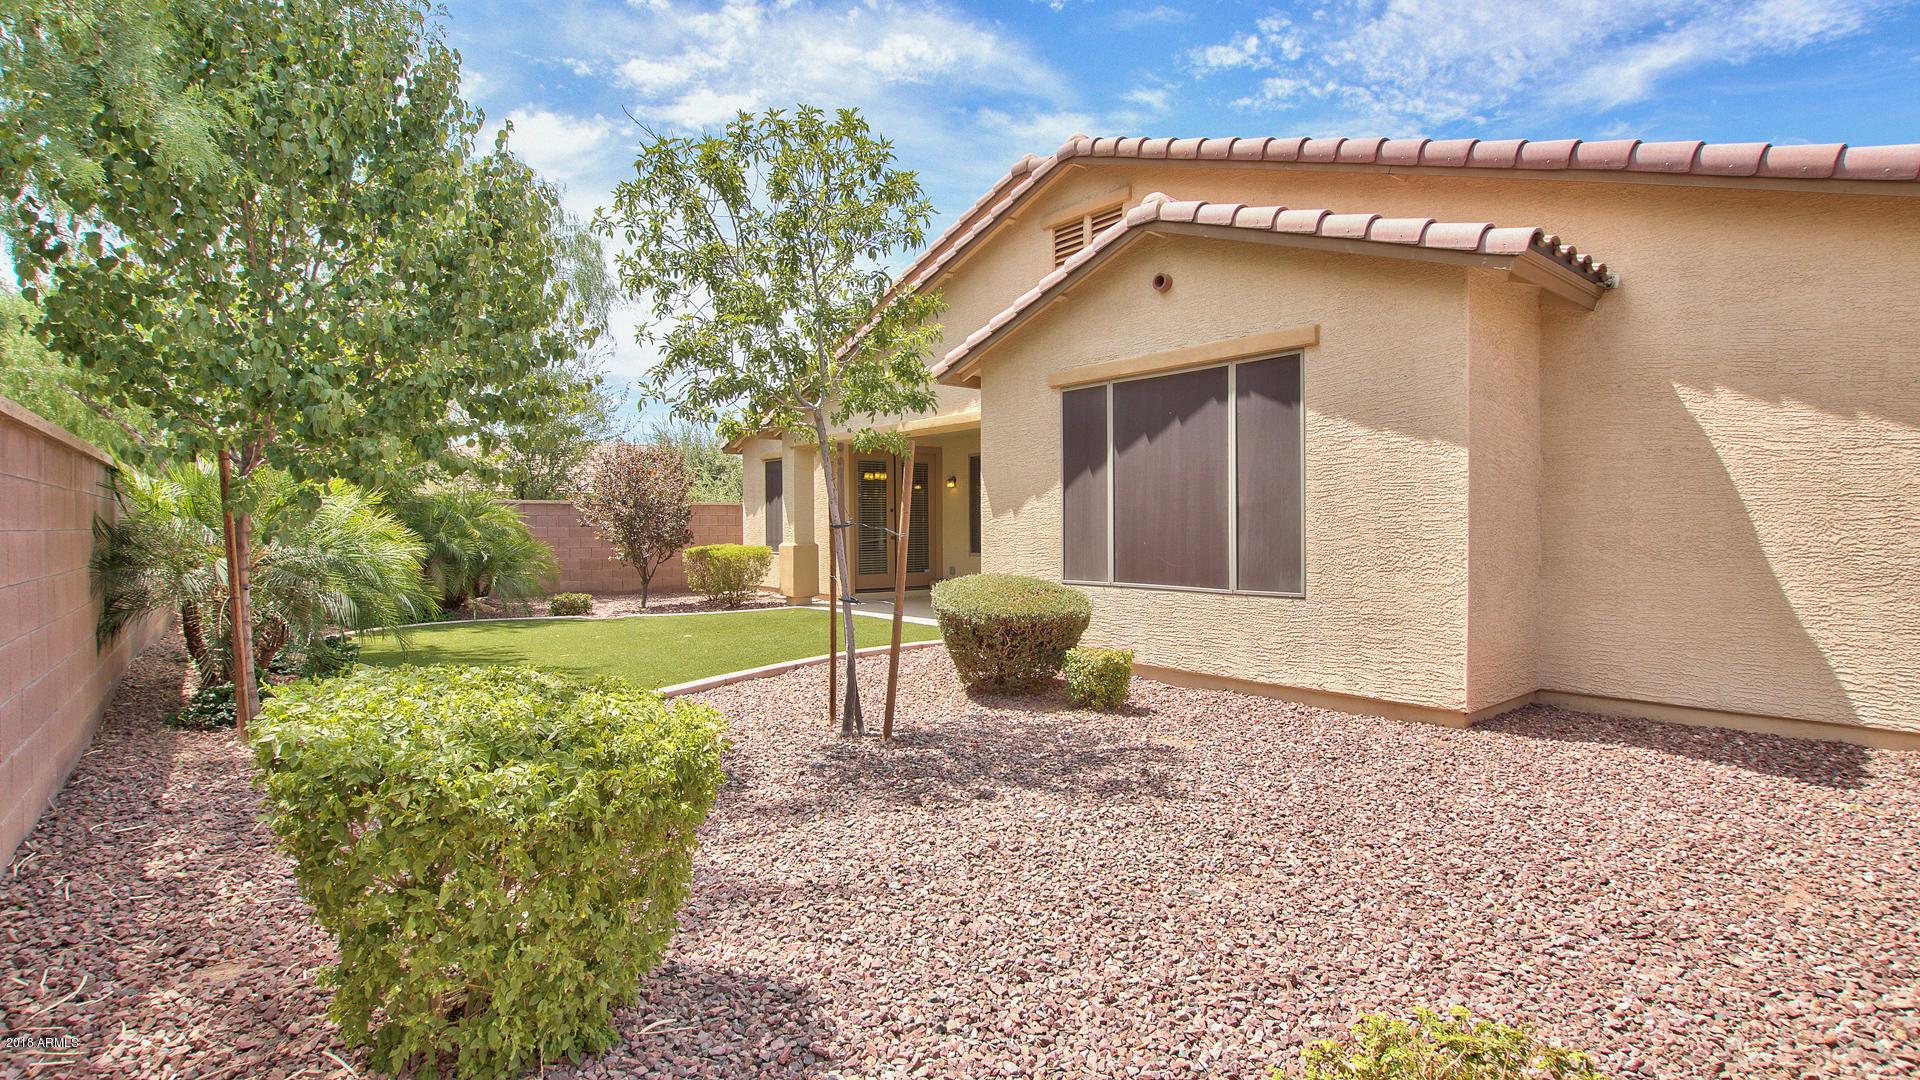 MLS 5798707 2505 E DONATO Drive, Gilbert, AZ 85298 Freeman Farms